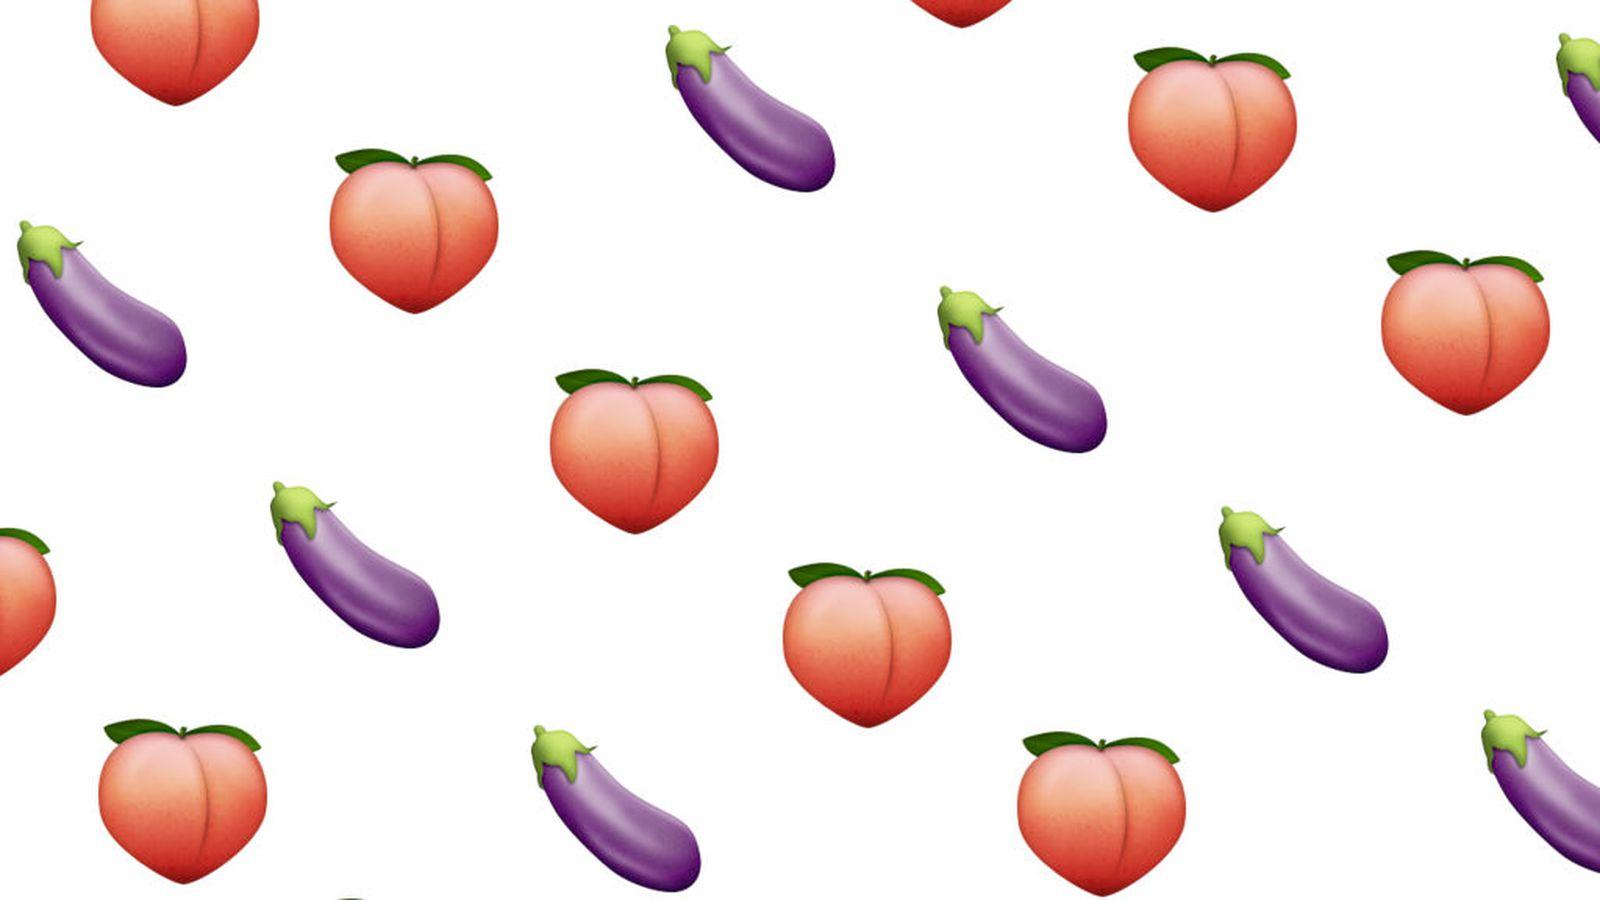 Emoji shouldn't look realistic